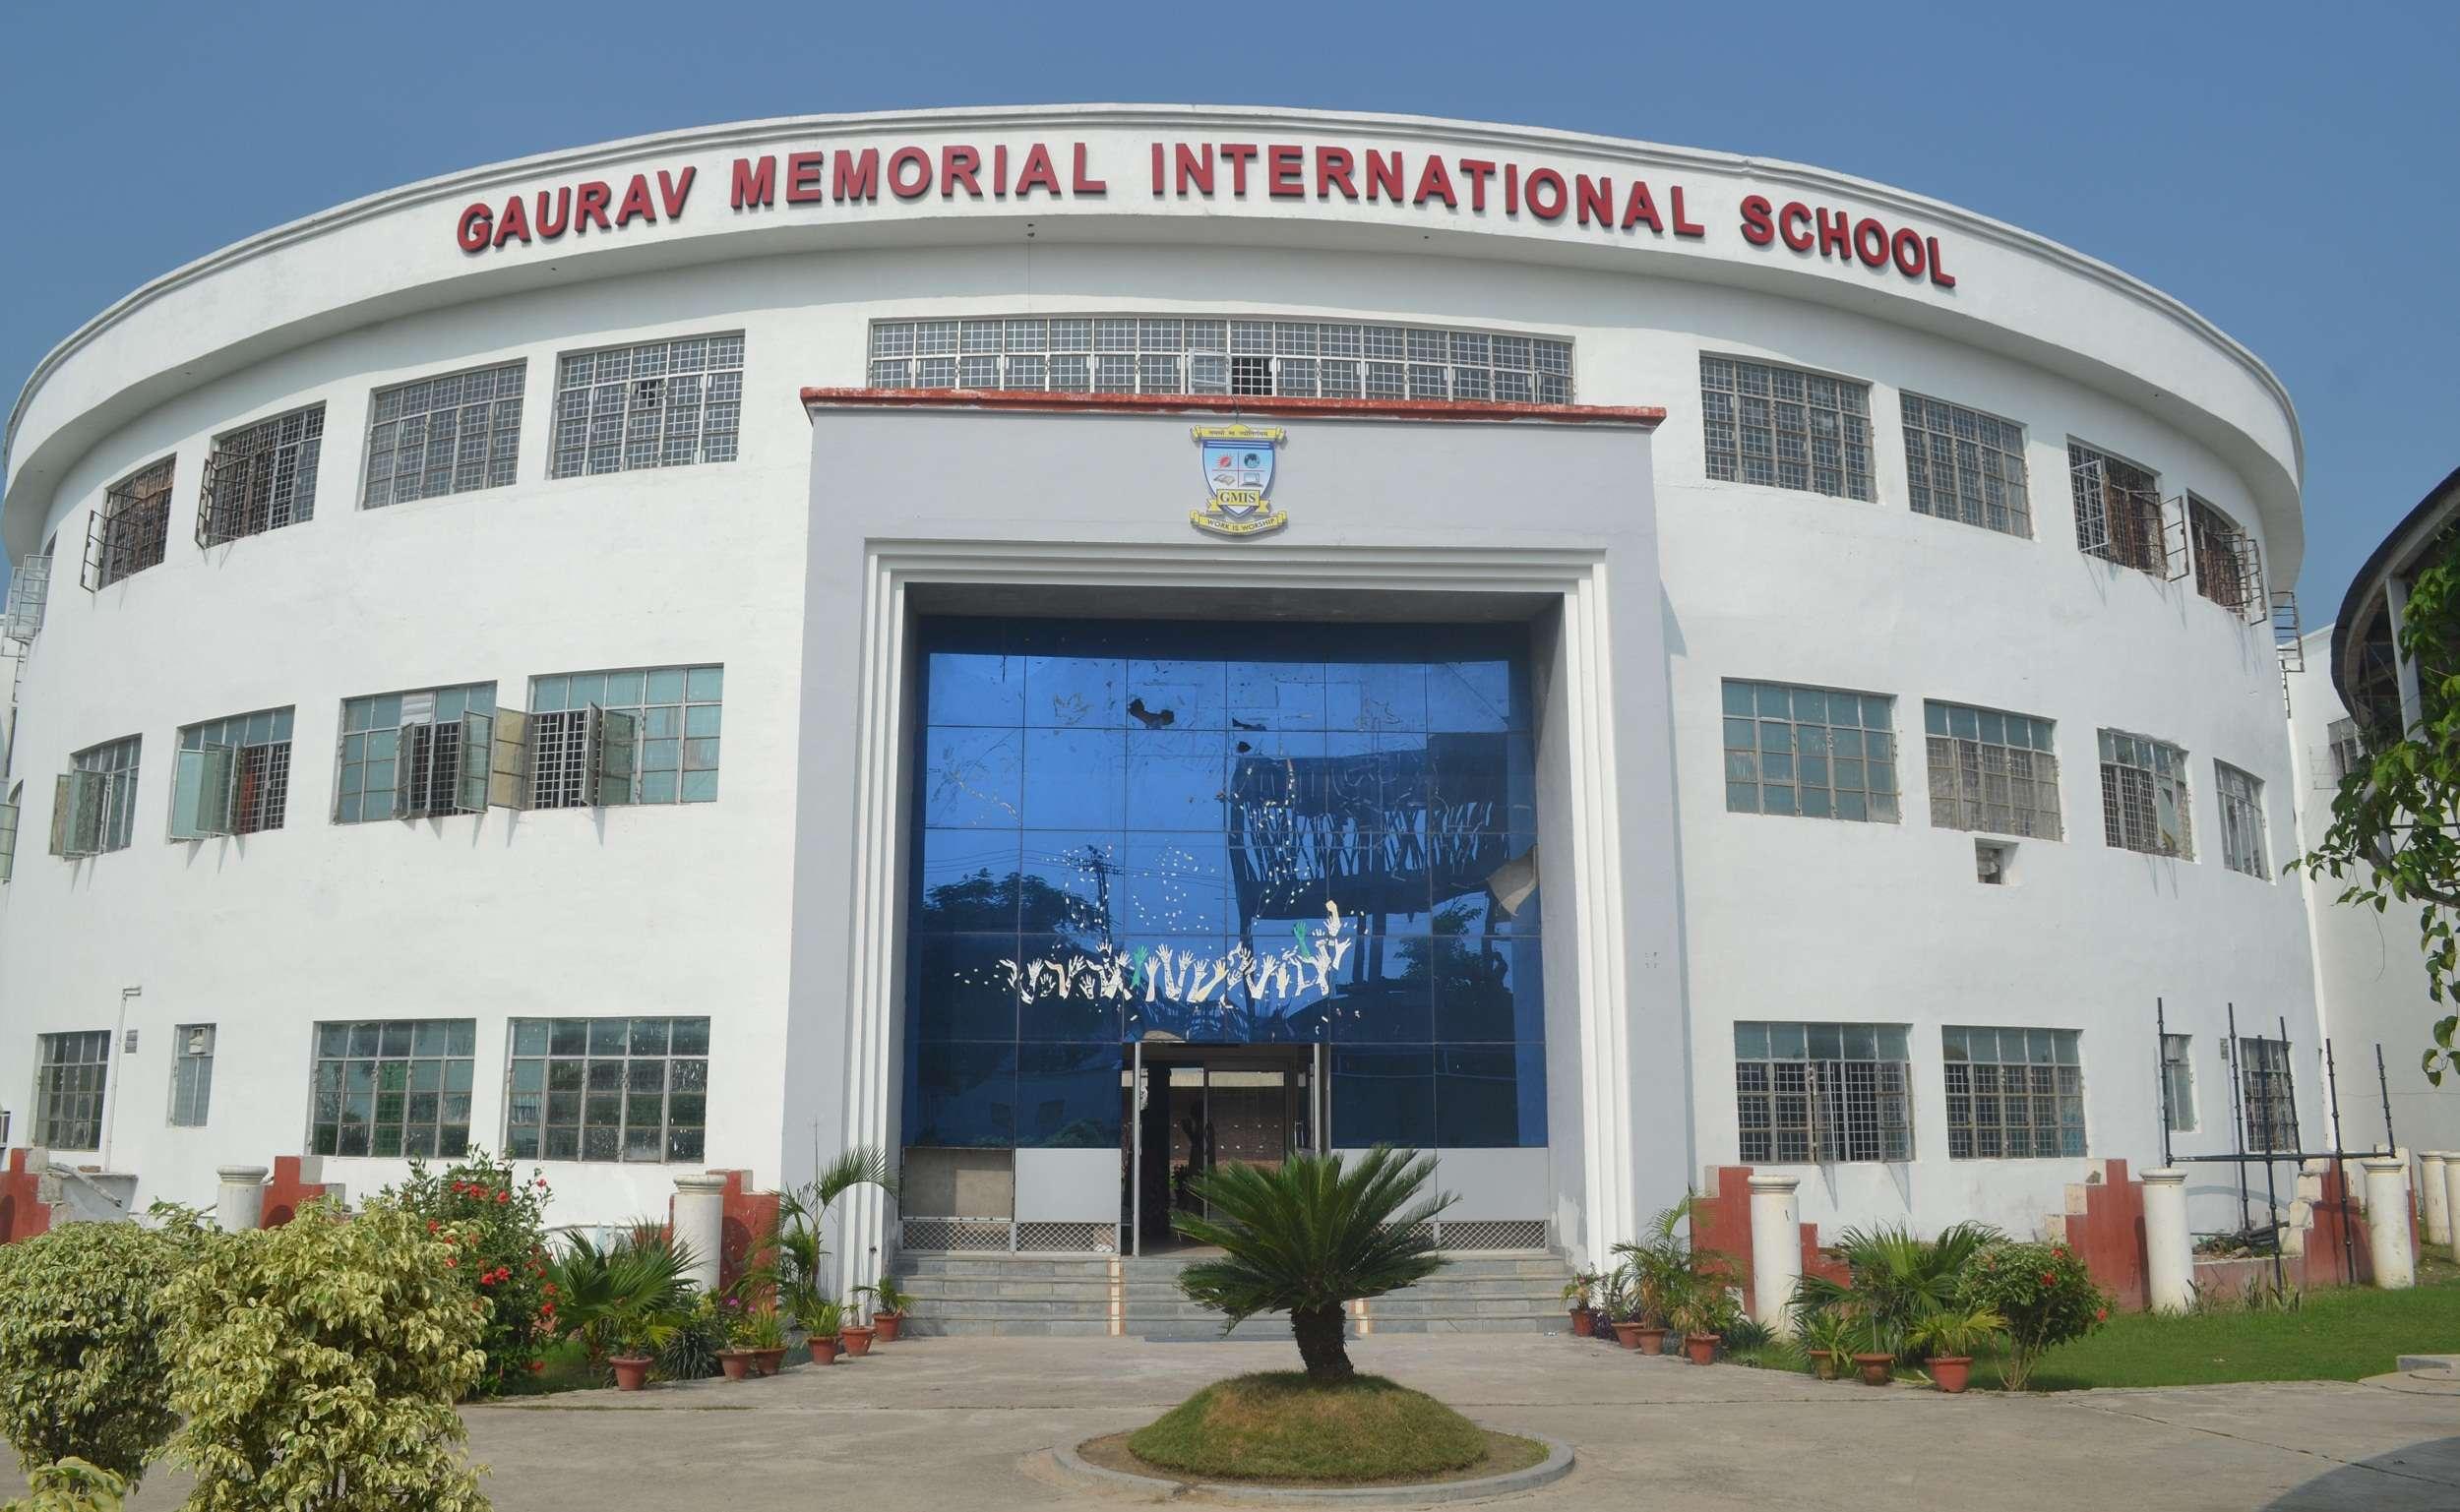 GAURAV MEMORIAL INTERNATIONAL SCHOOL 673 BITHOOR ROAD KALYAN PUR KANPUR UP 2130761